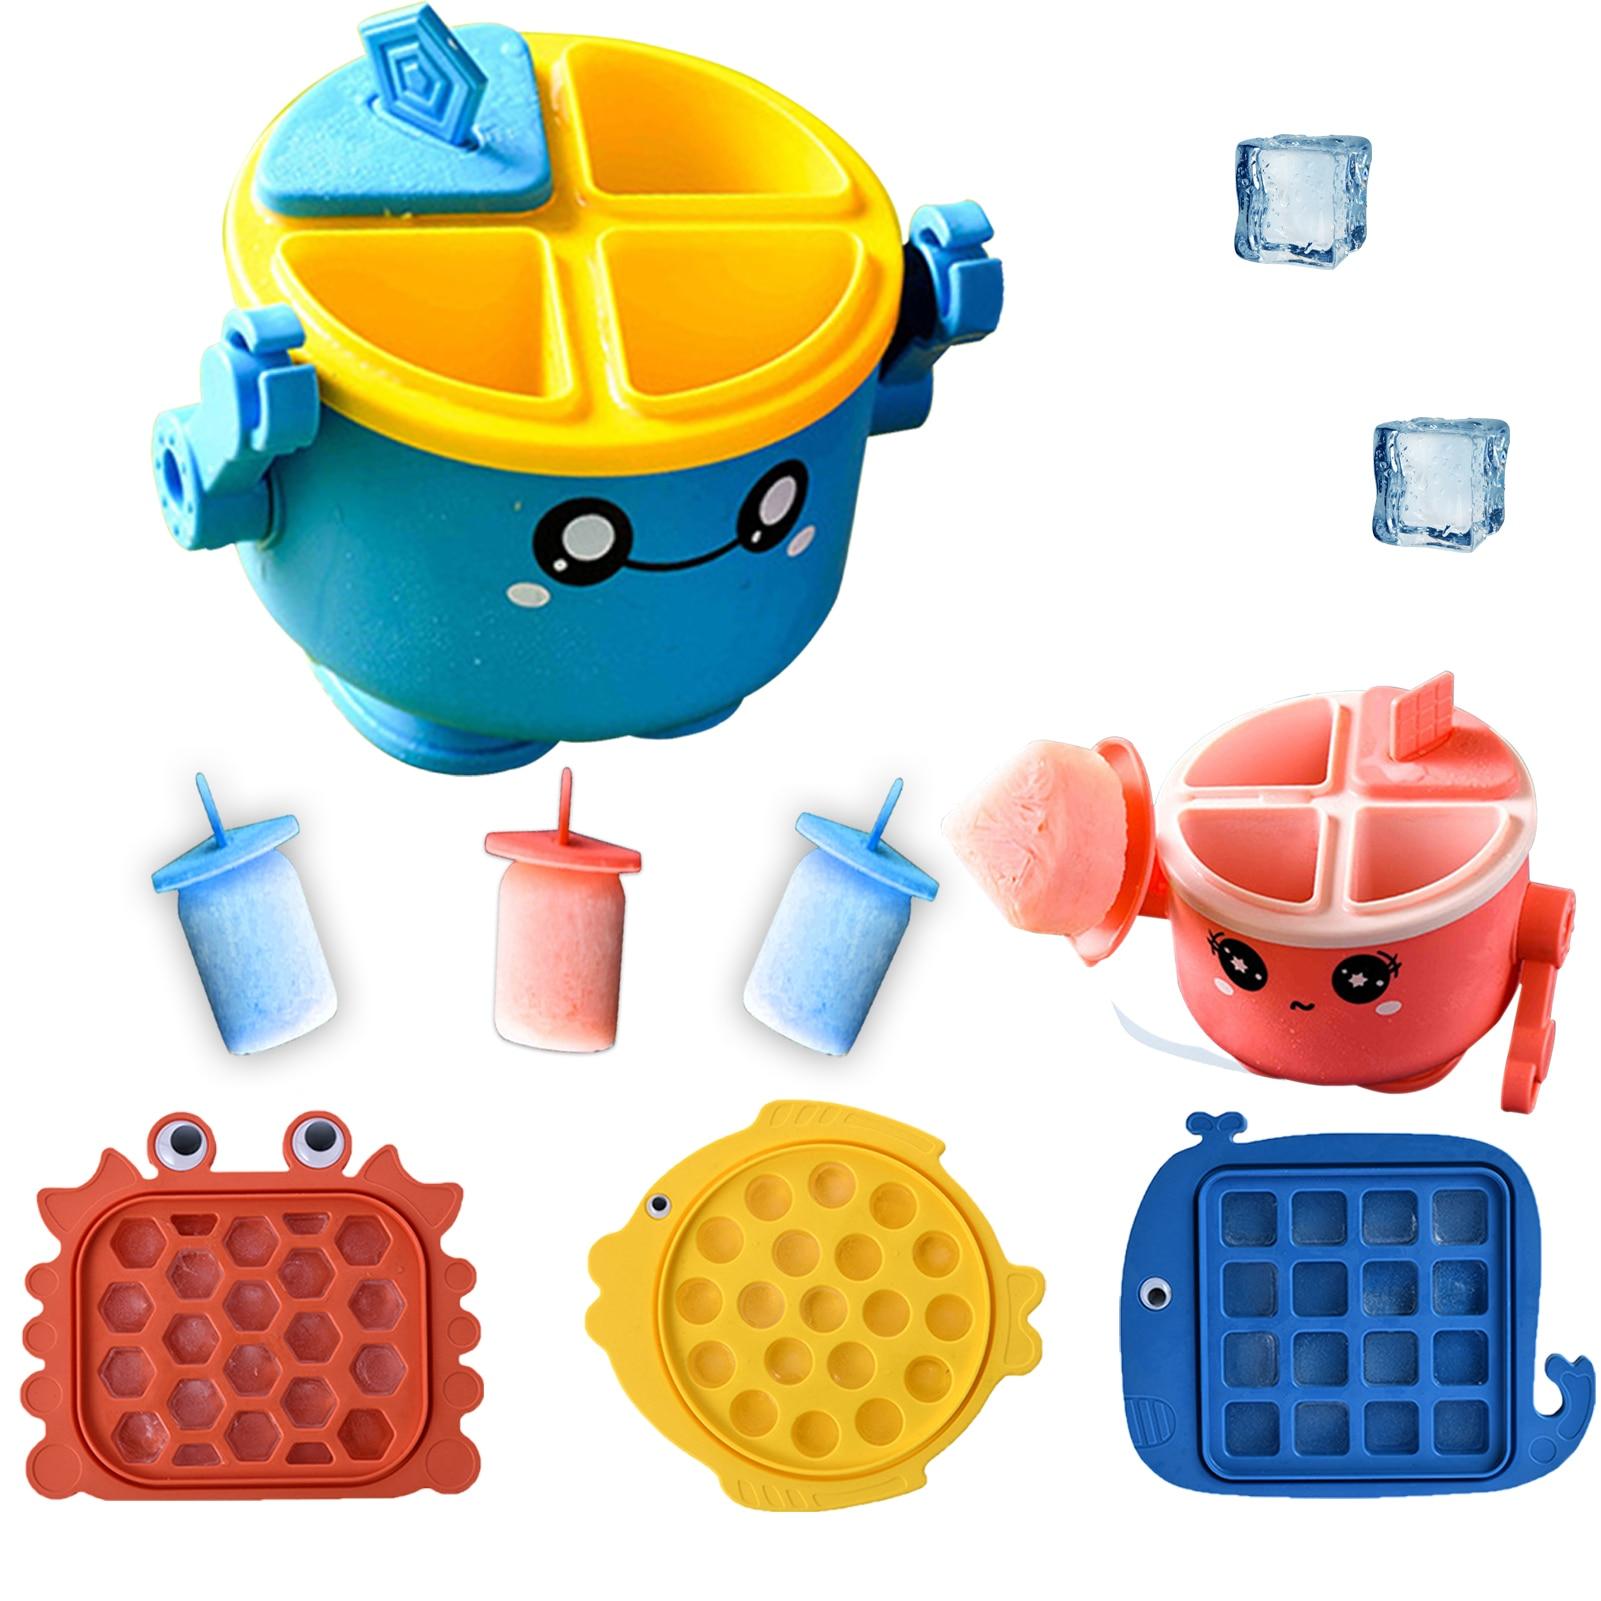 DIY Ice Tray Ice Cube Popsicle Mold Cartoon Homemade Popsicle Ice Cream Mold Custom Wholesale Ice Mold Home Ice Cream Tools